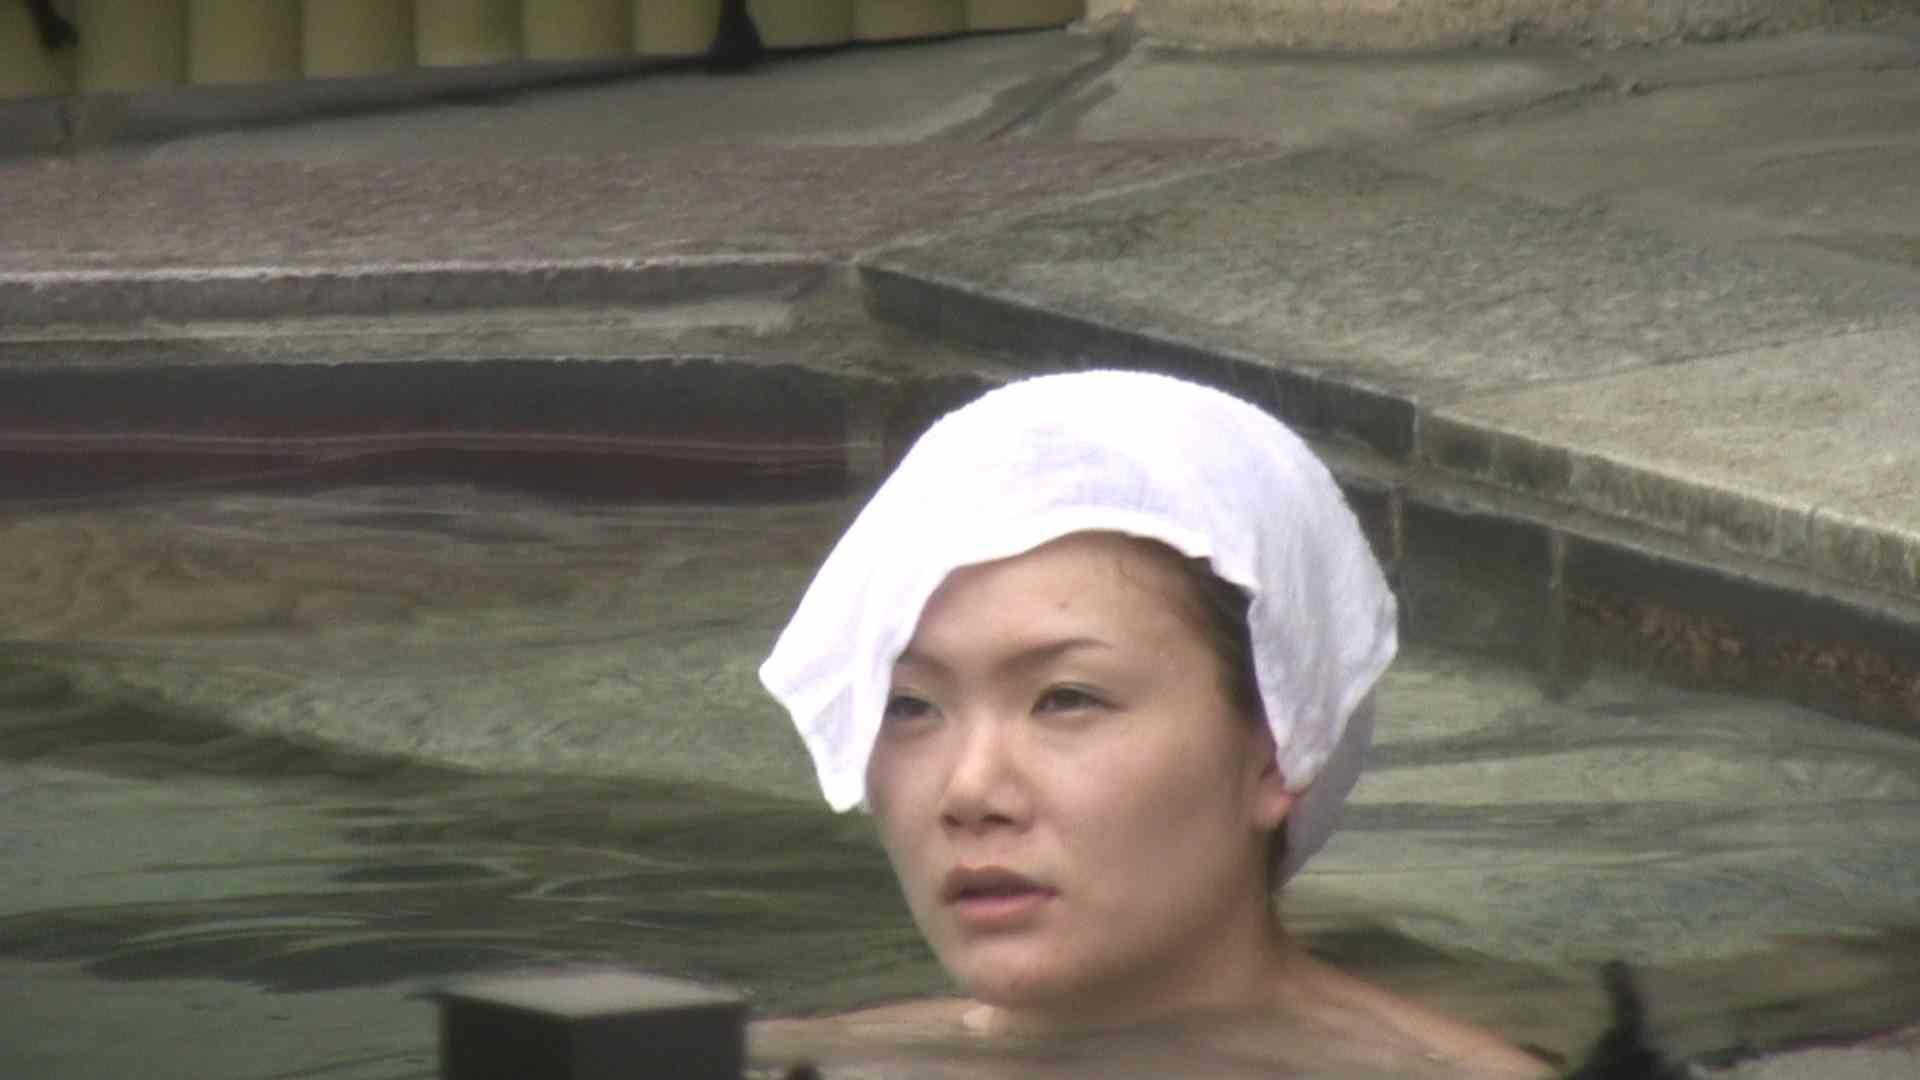 Aquaな露天風呂Vol.12【VIP】 綺麗なOLたち | 盗撮  84枚 79